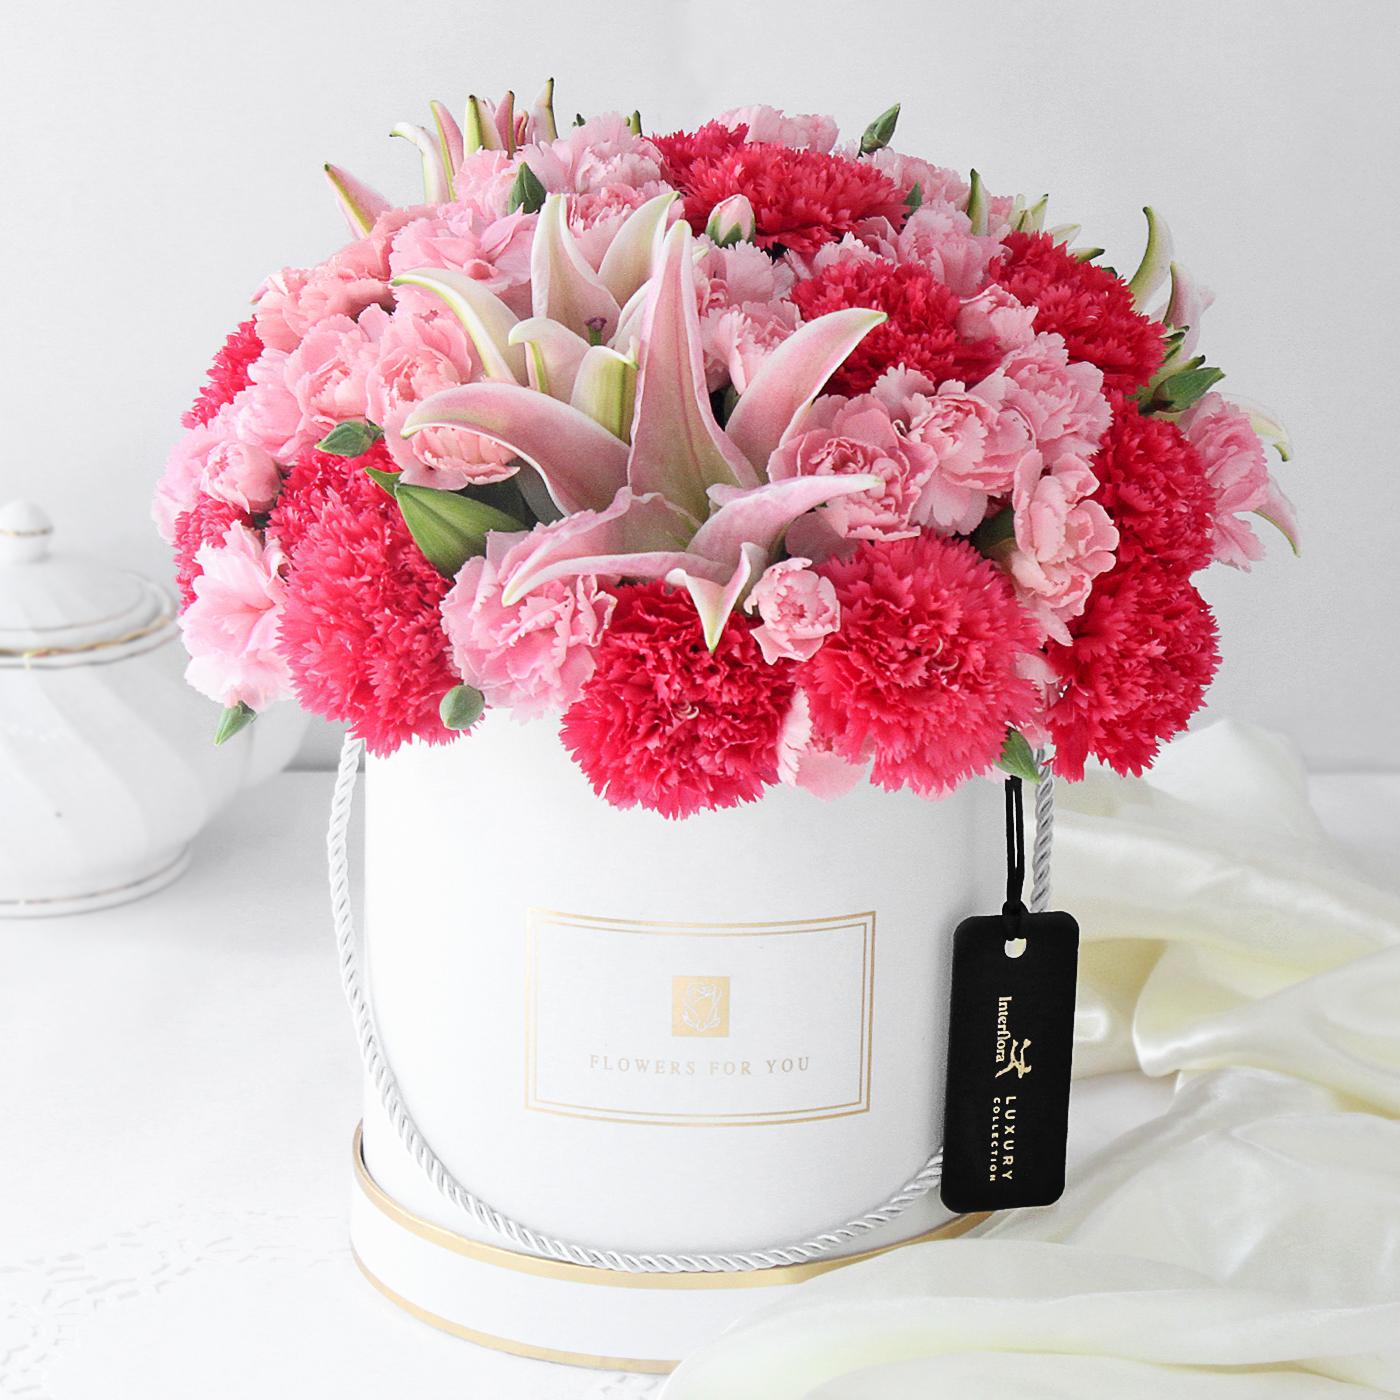 Carnation - The Perfect Pink Arrangement